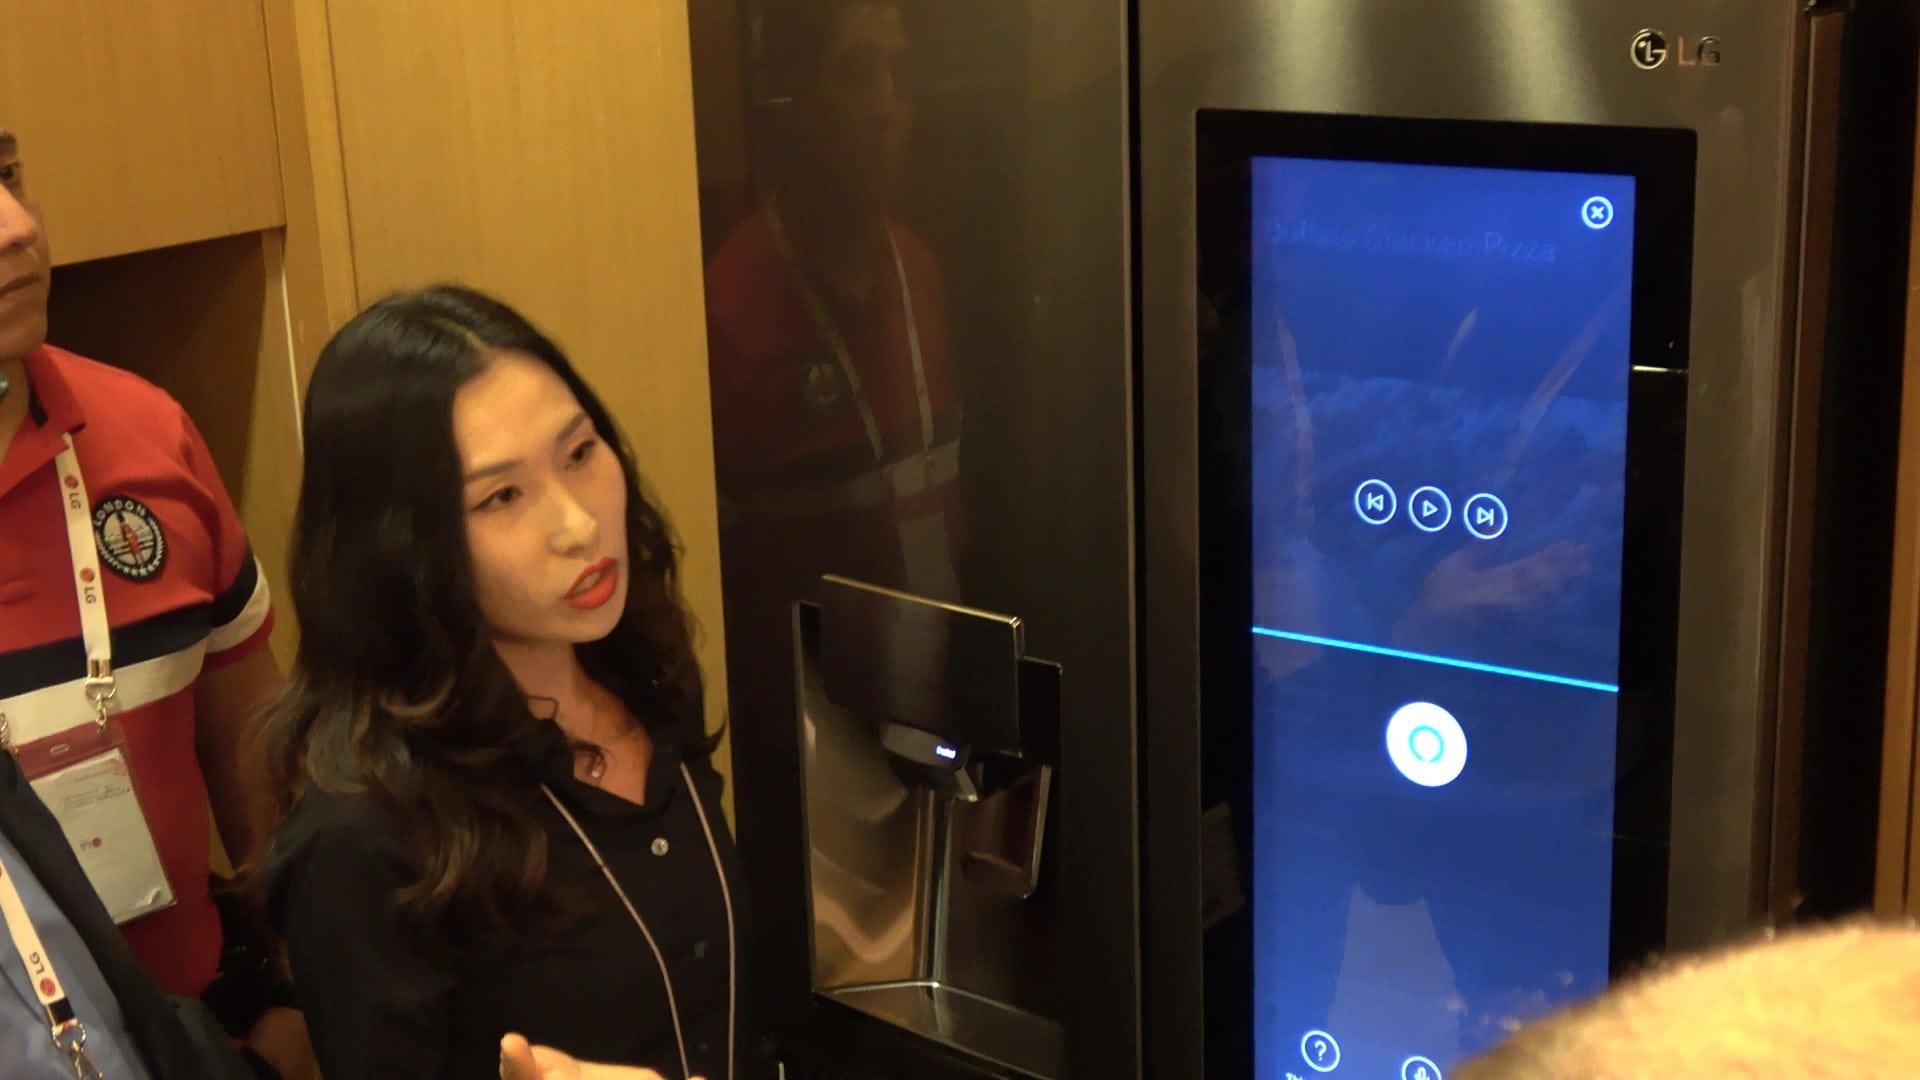 LG Tour - Seocho R&D Future Home (3)